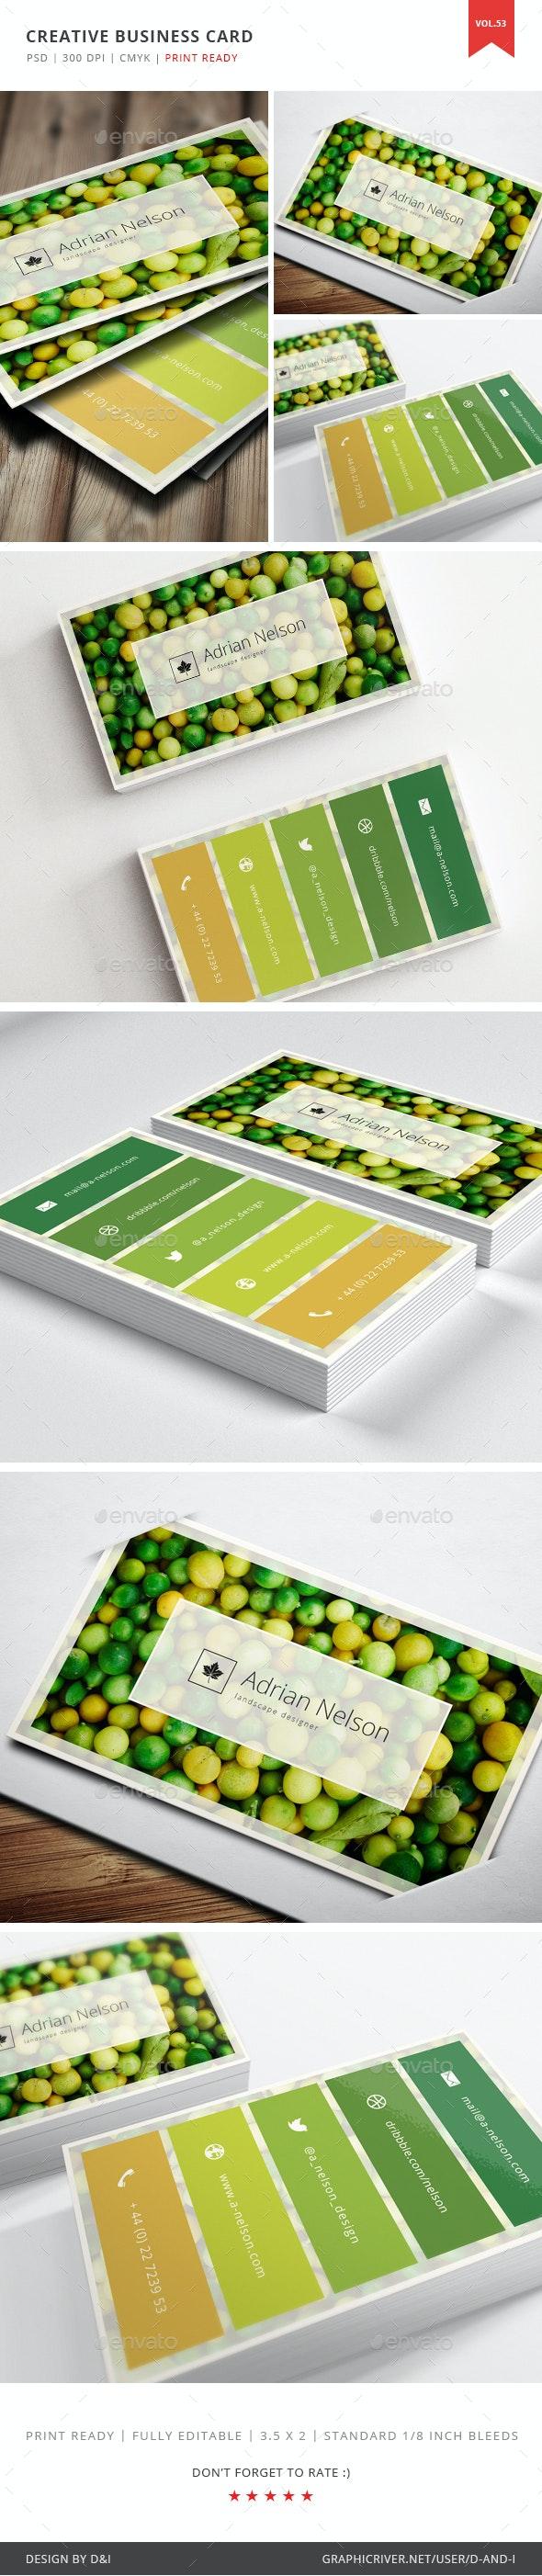 Creative Landscape Designer Business Card - Vol. 53 - Creative Business Cards